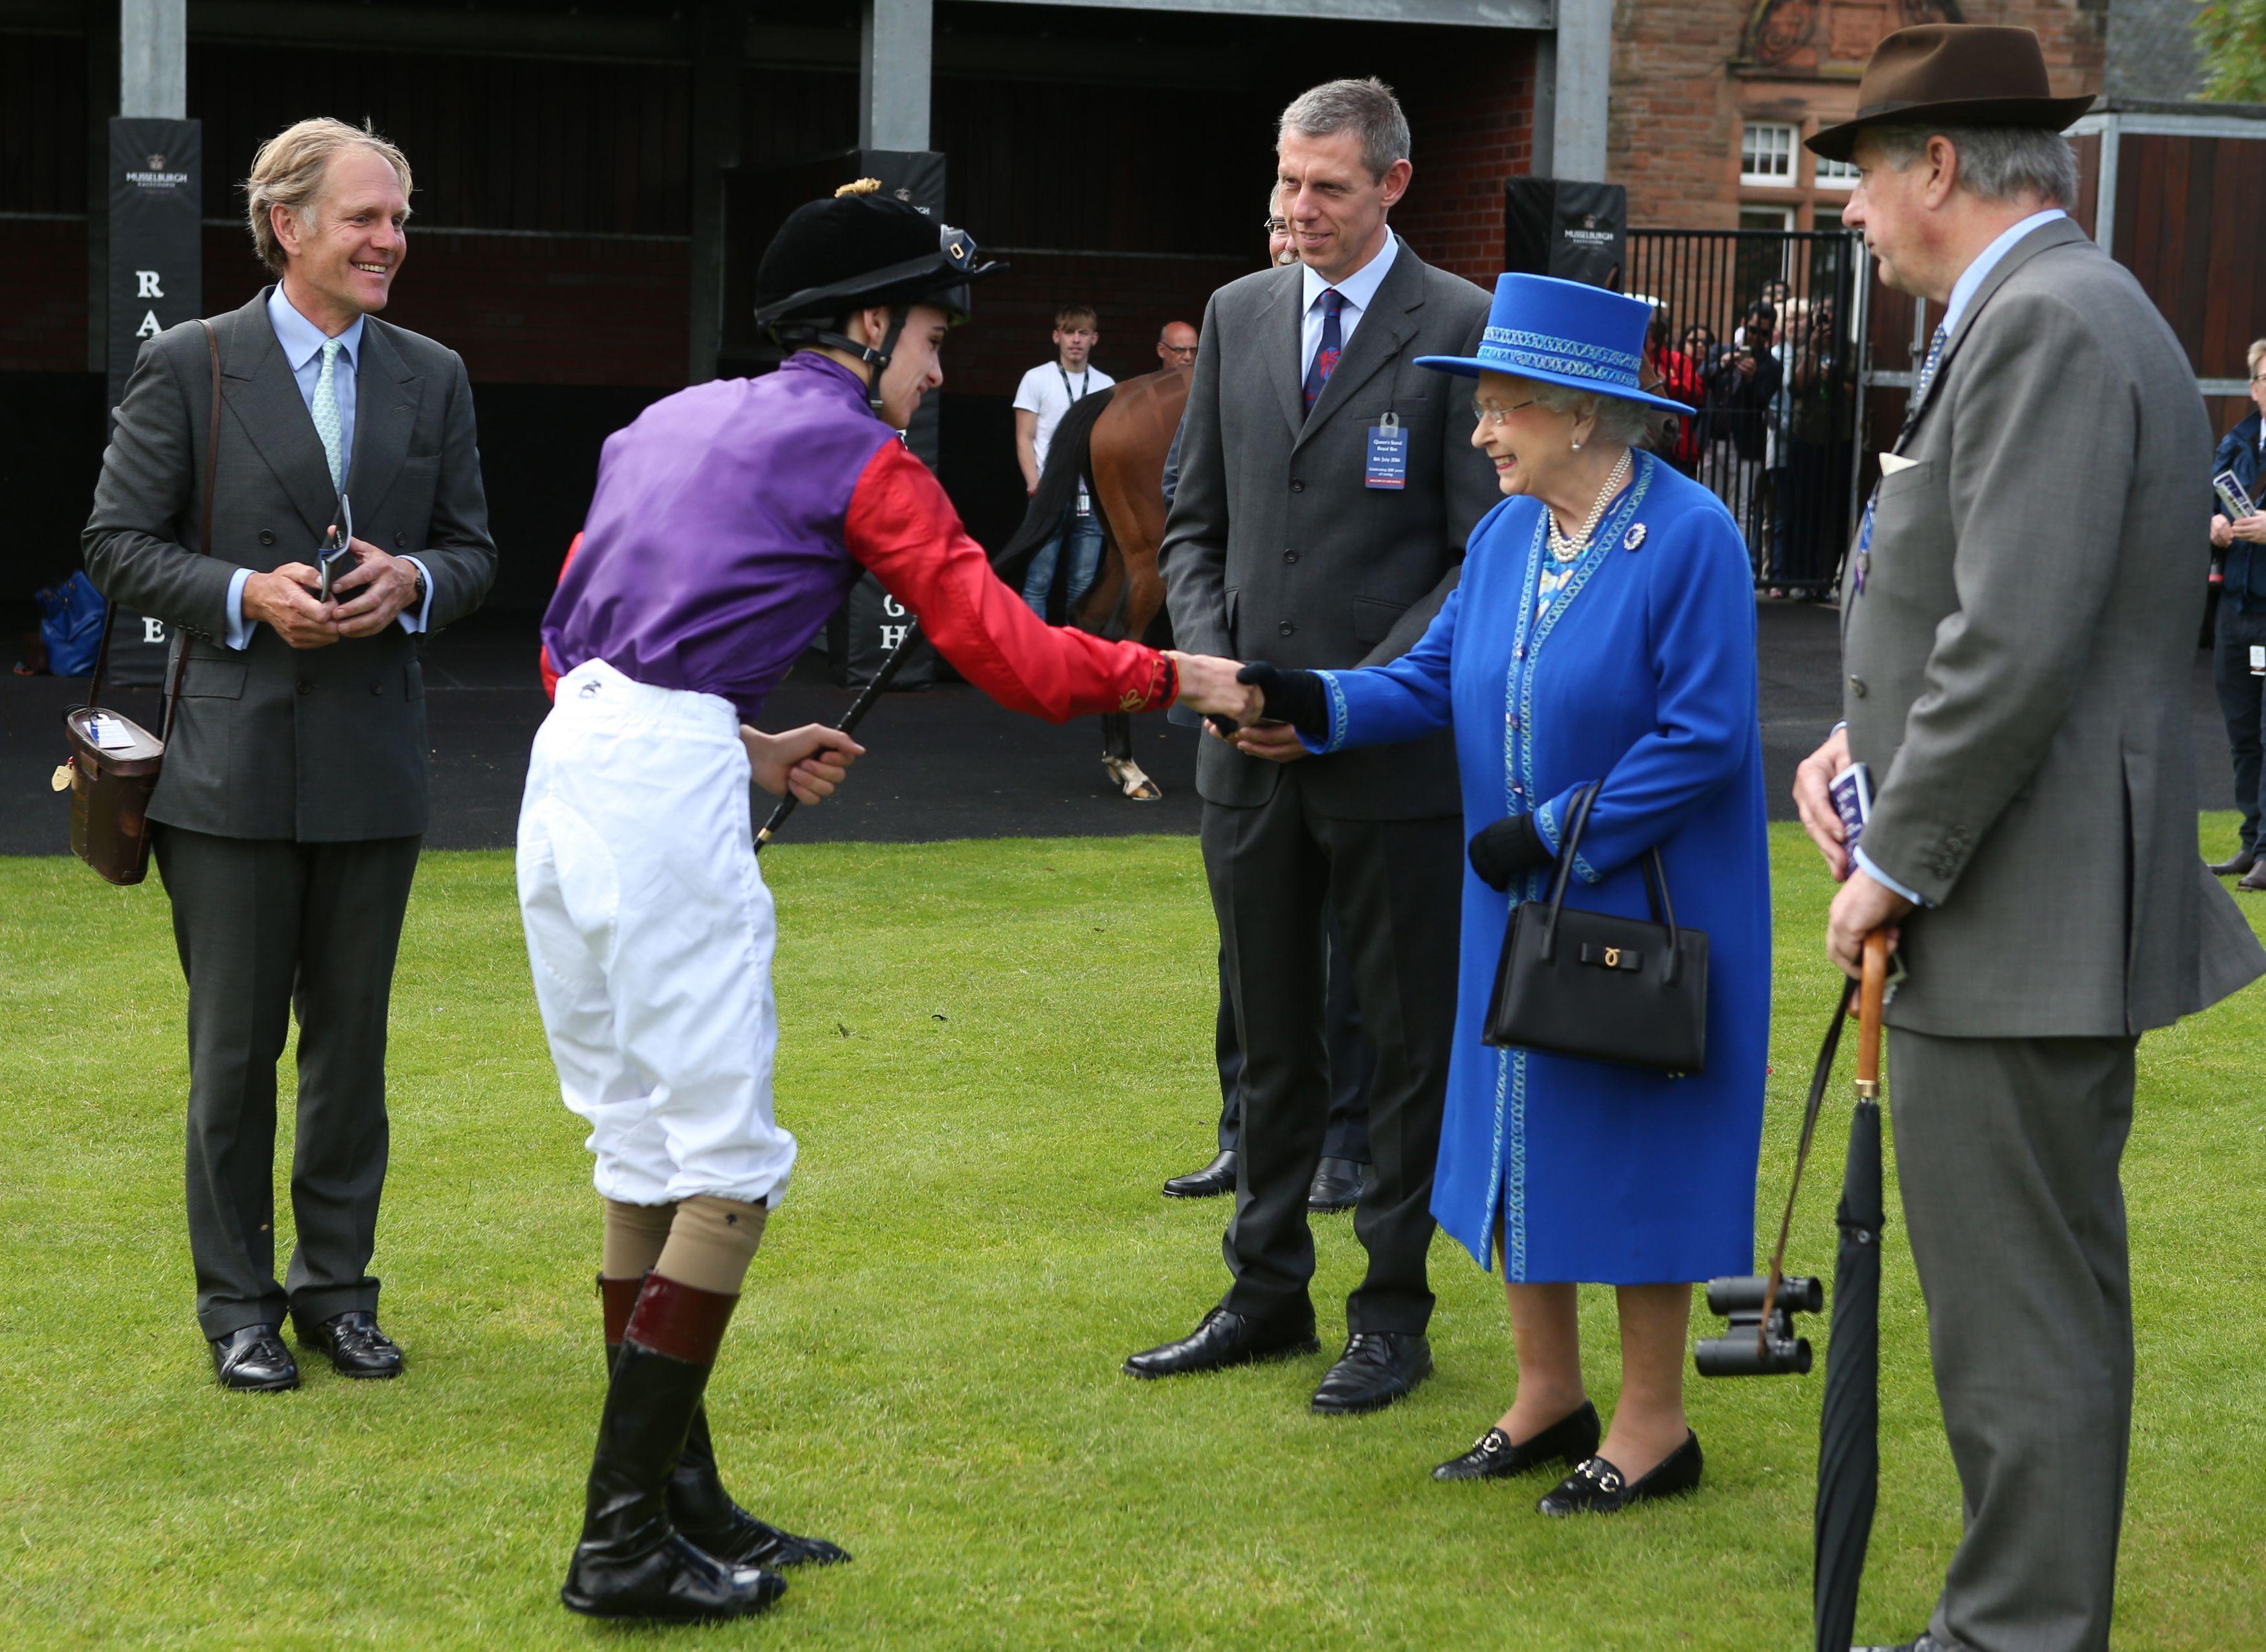 Royal visit to Scotland - Day 8